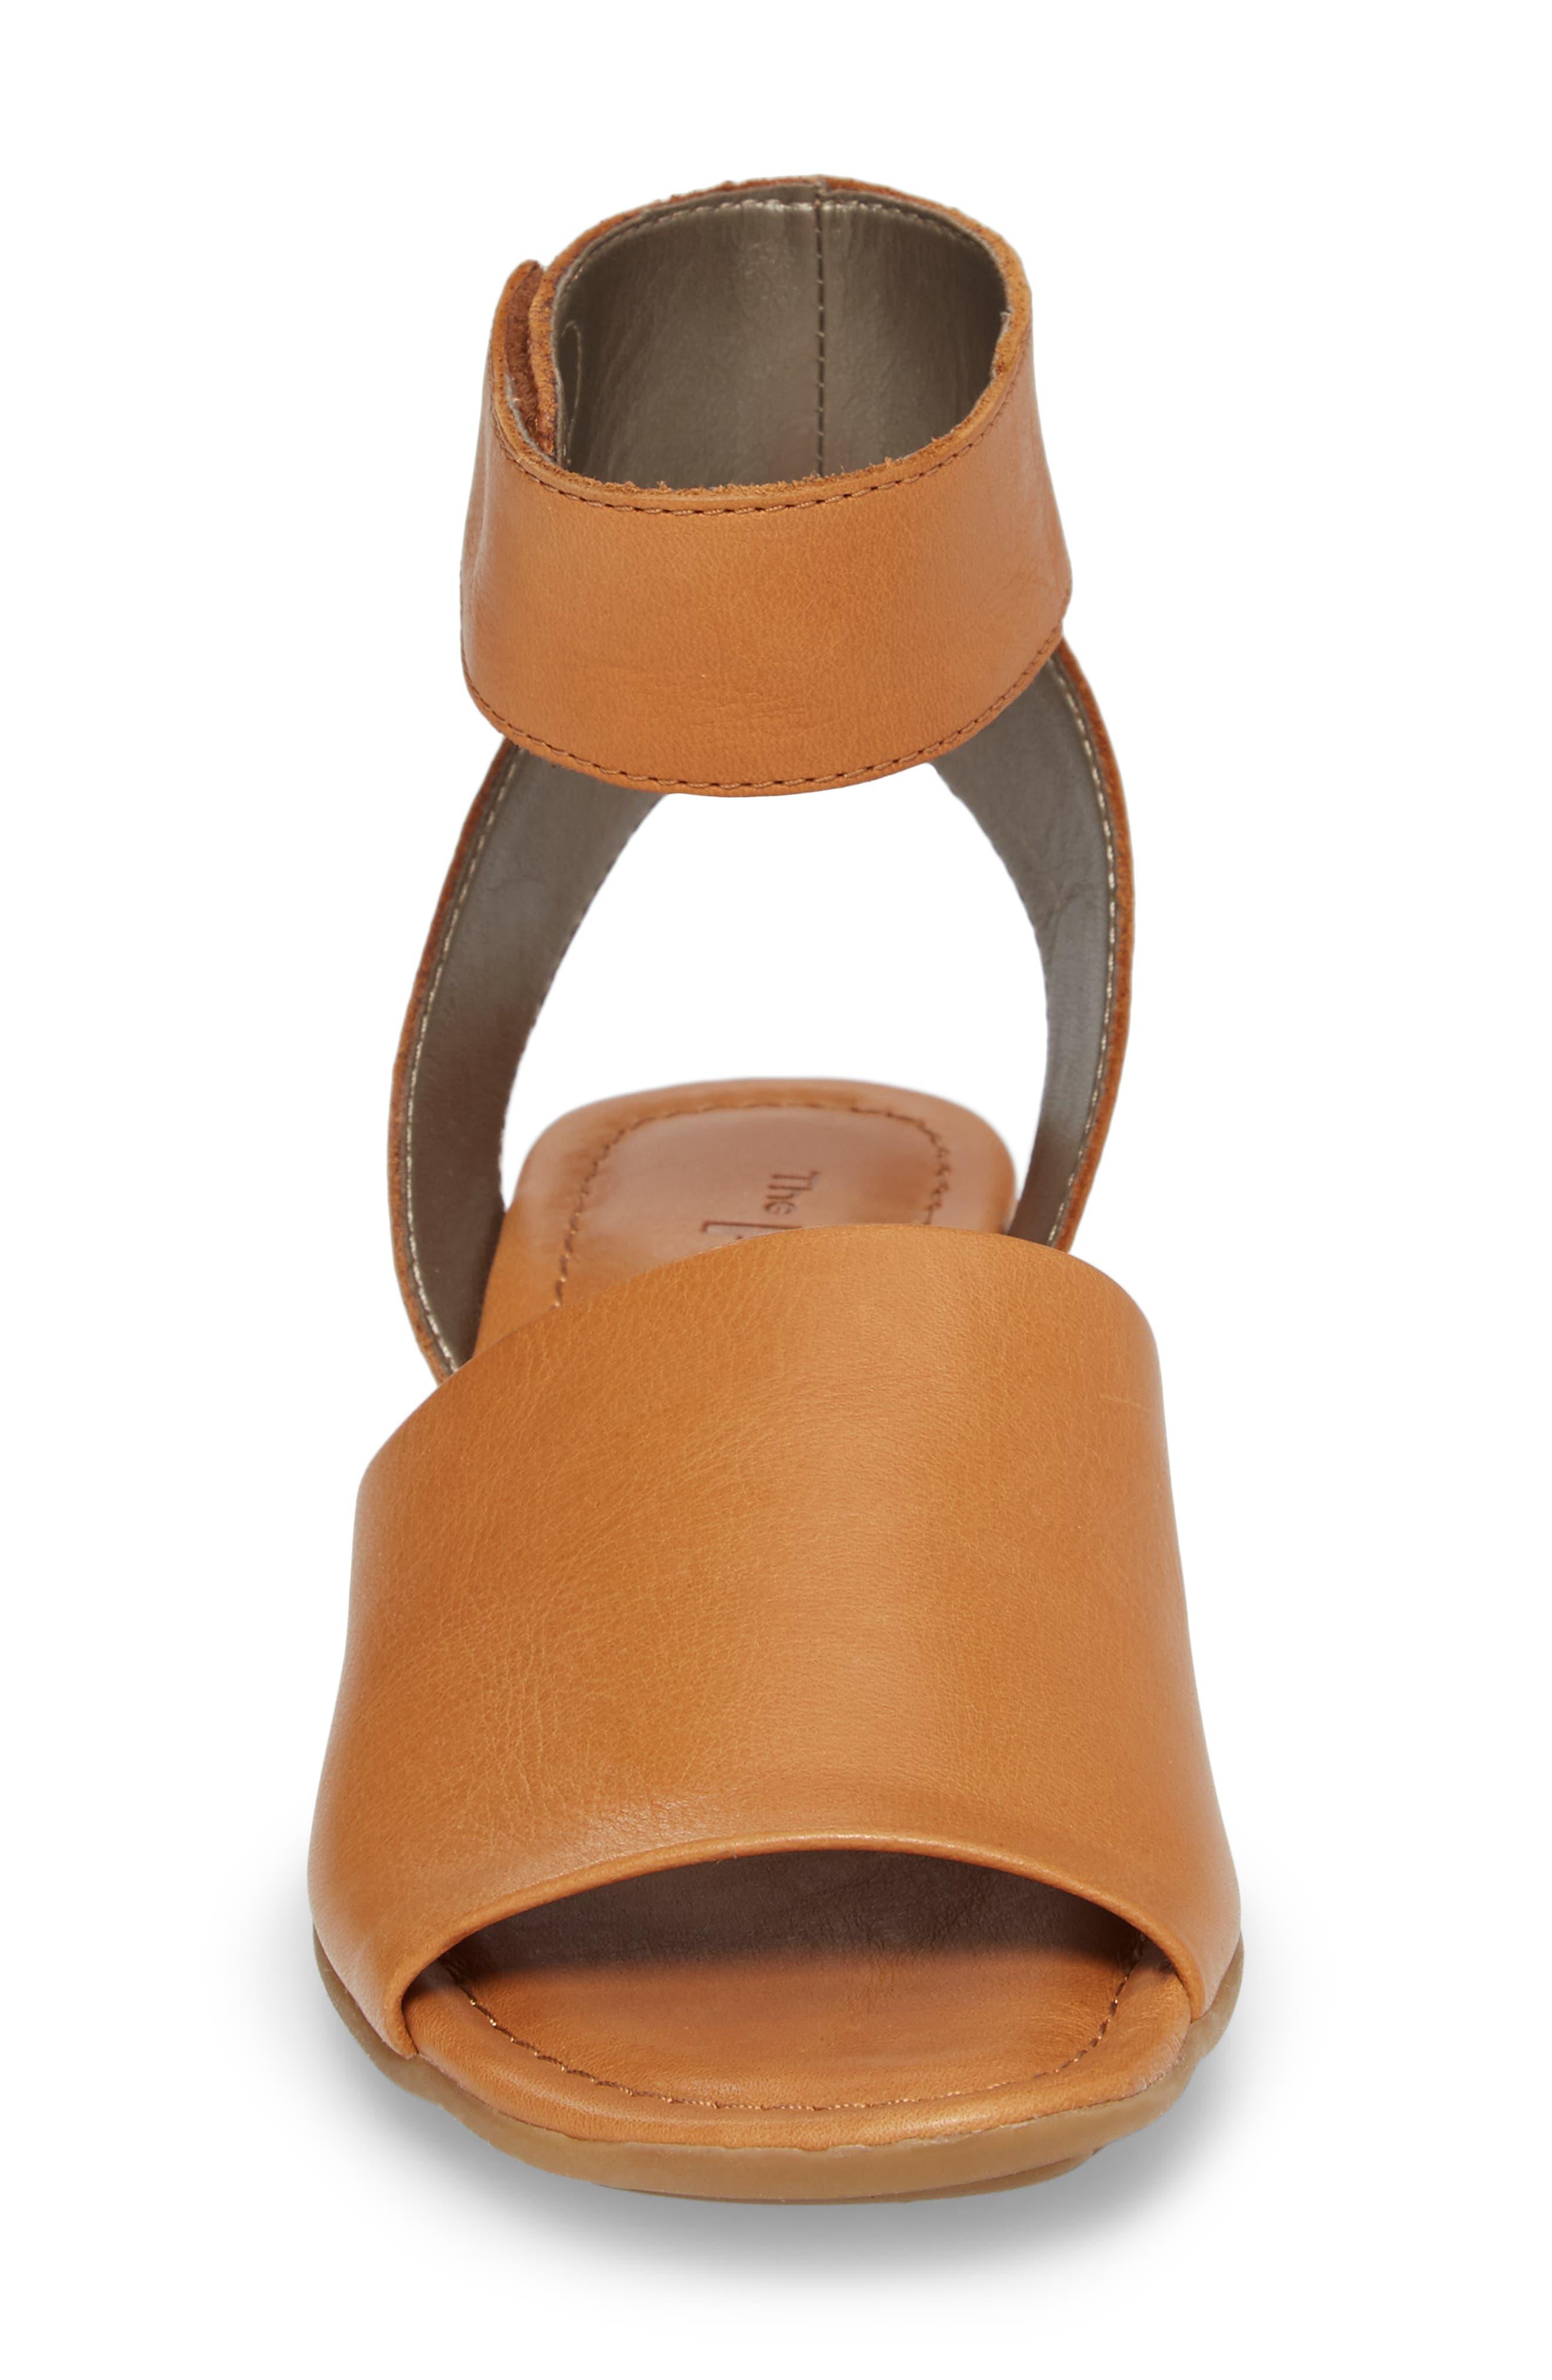 'Beglad' Leather Ankle Strap Sandal,                             Alternate thumbnail 51, color,